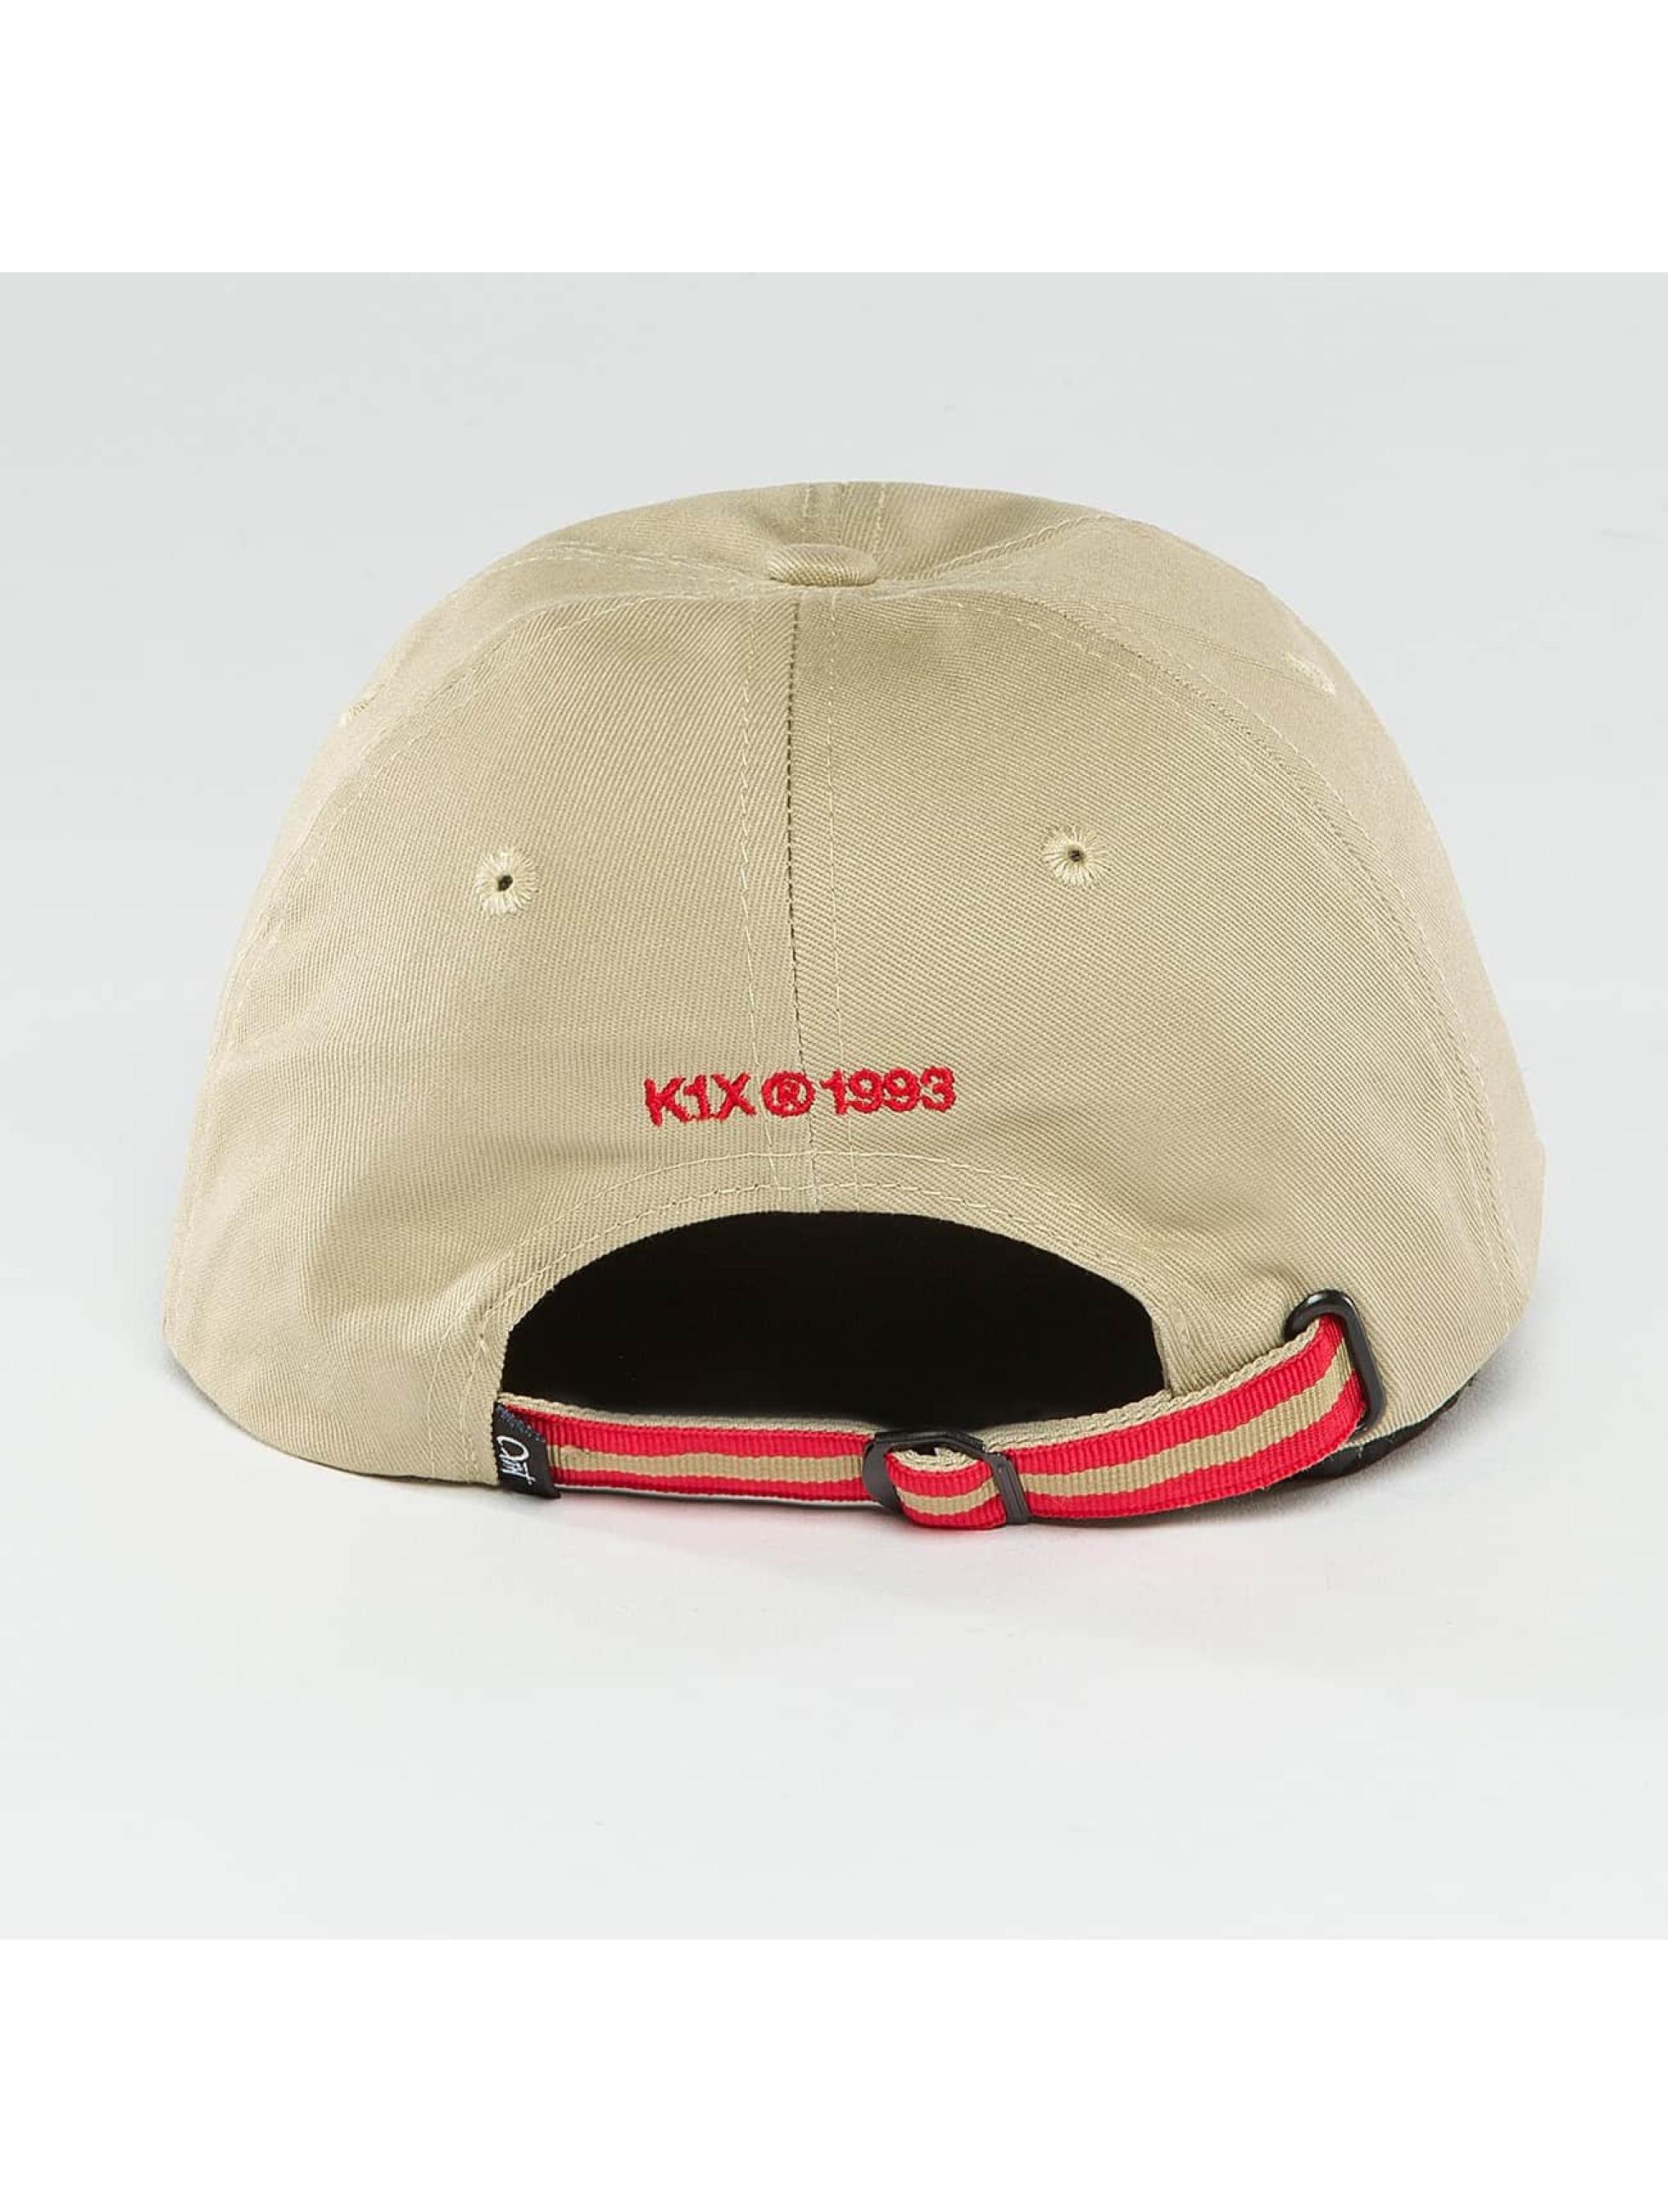 K1X Snapback Cap Play Hard Basketball Sports khaki